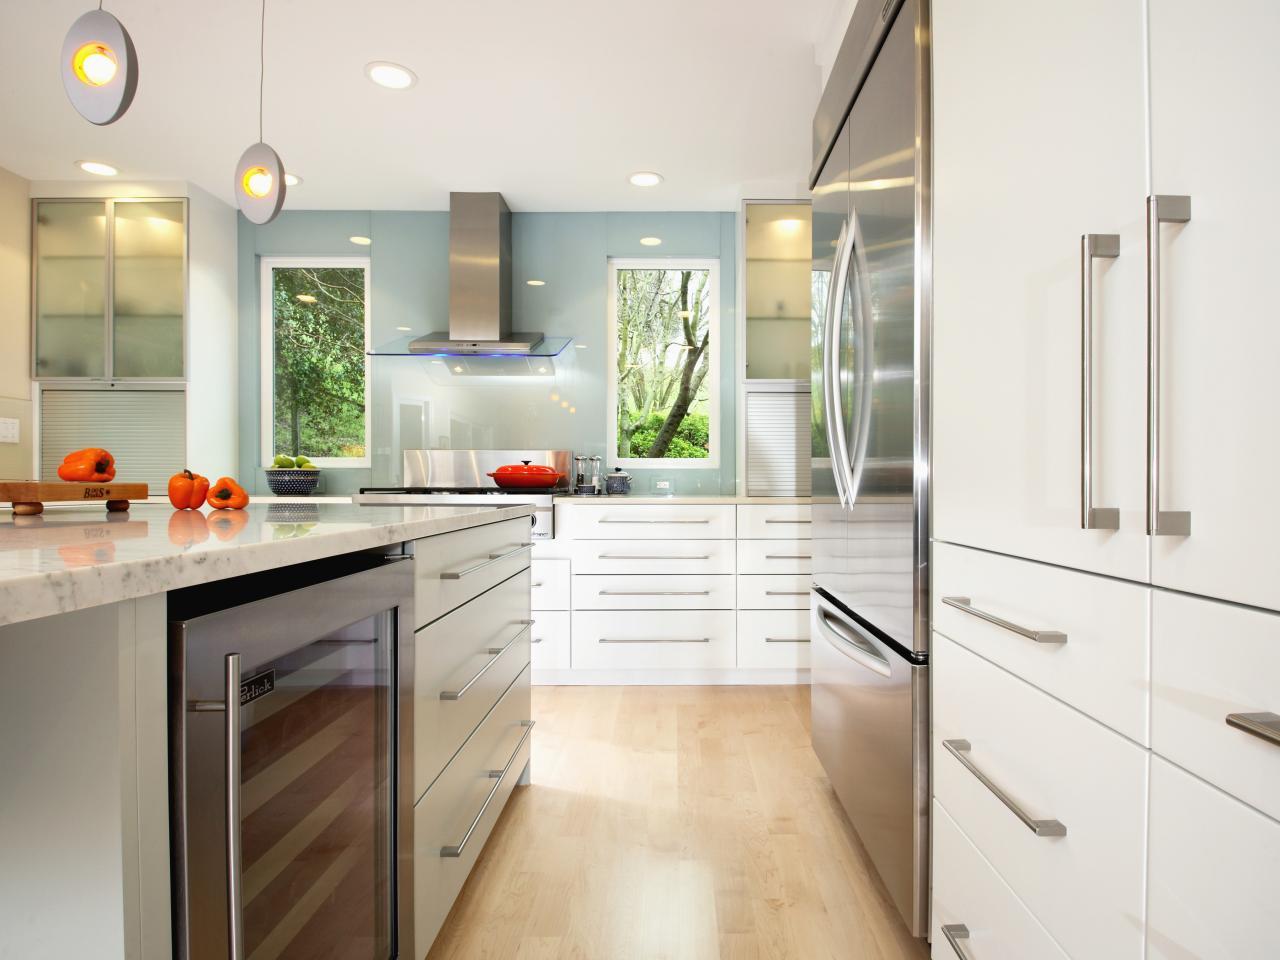 Modern White Kitchen Pics: Photo Page